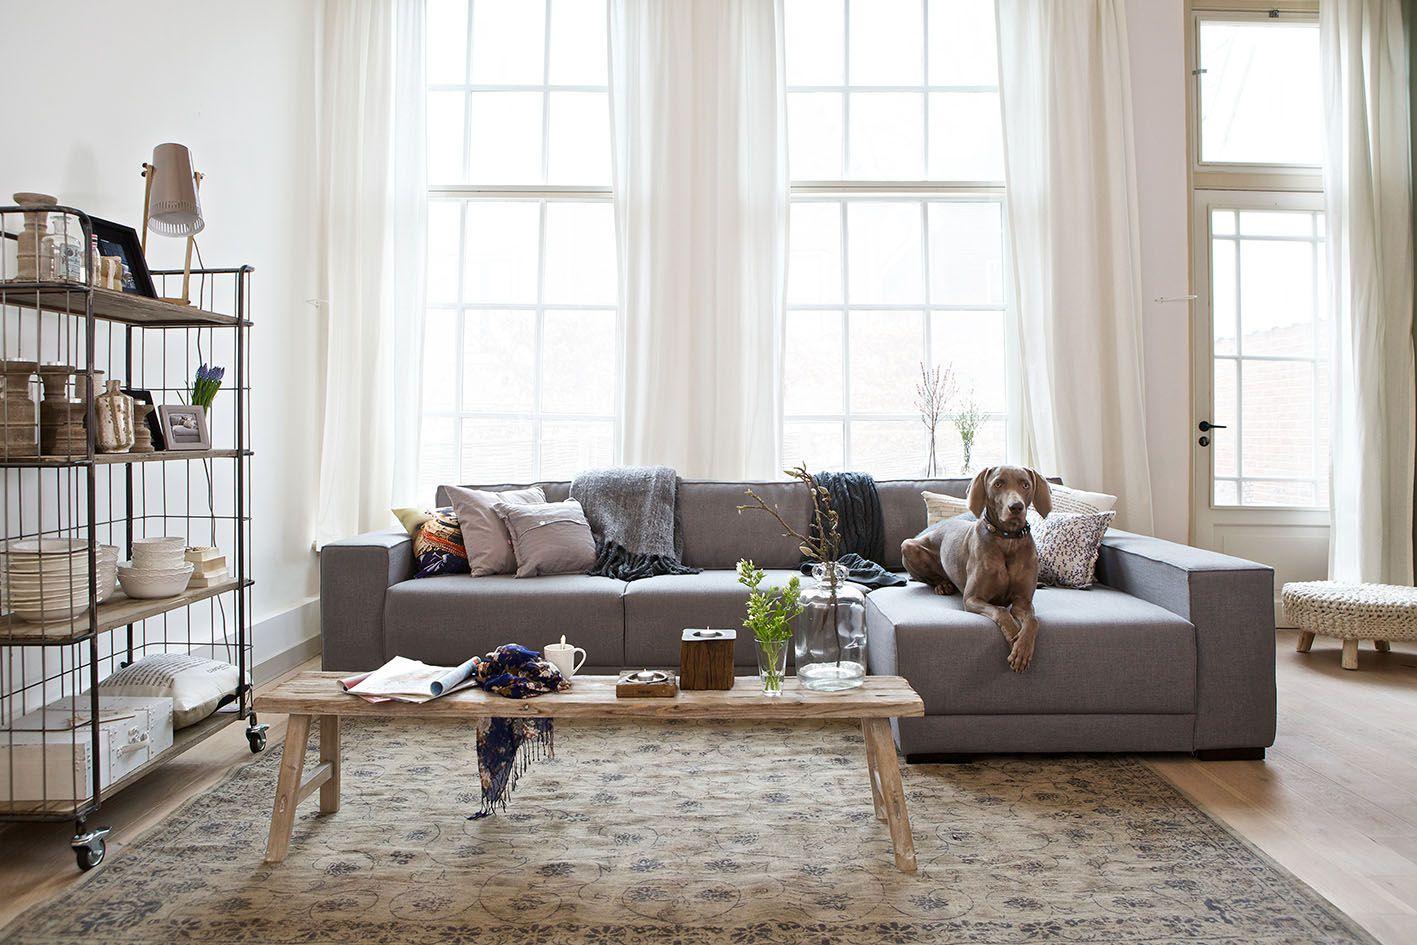 BePureHome hoekbank Neat grijs - Warme woonkamer | Pinterest ...